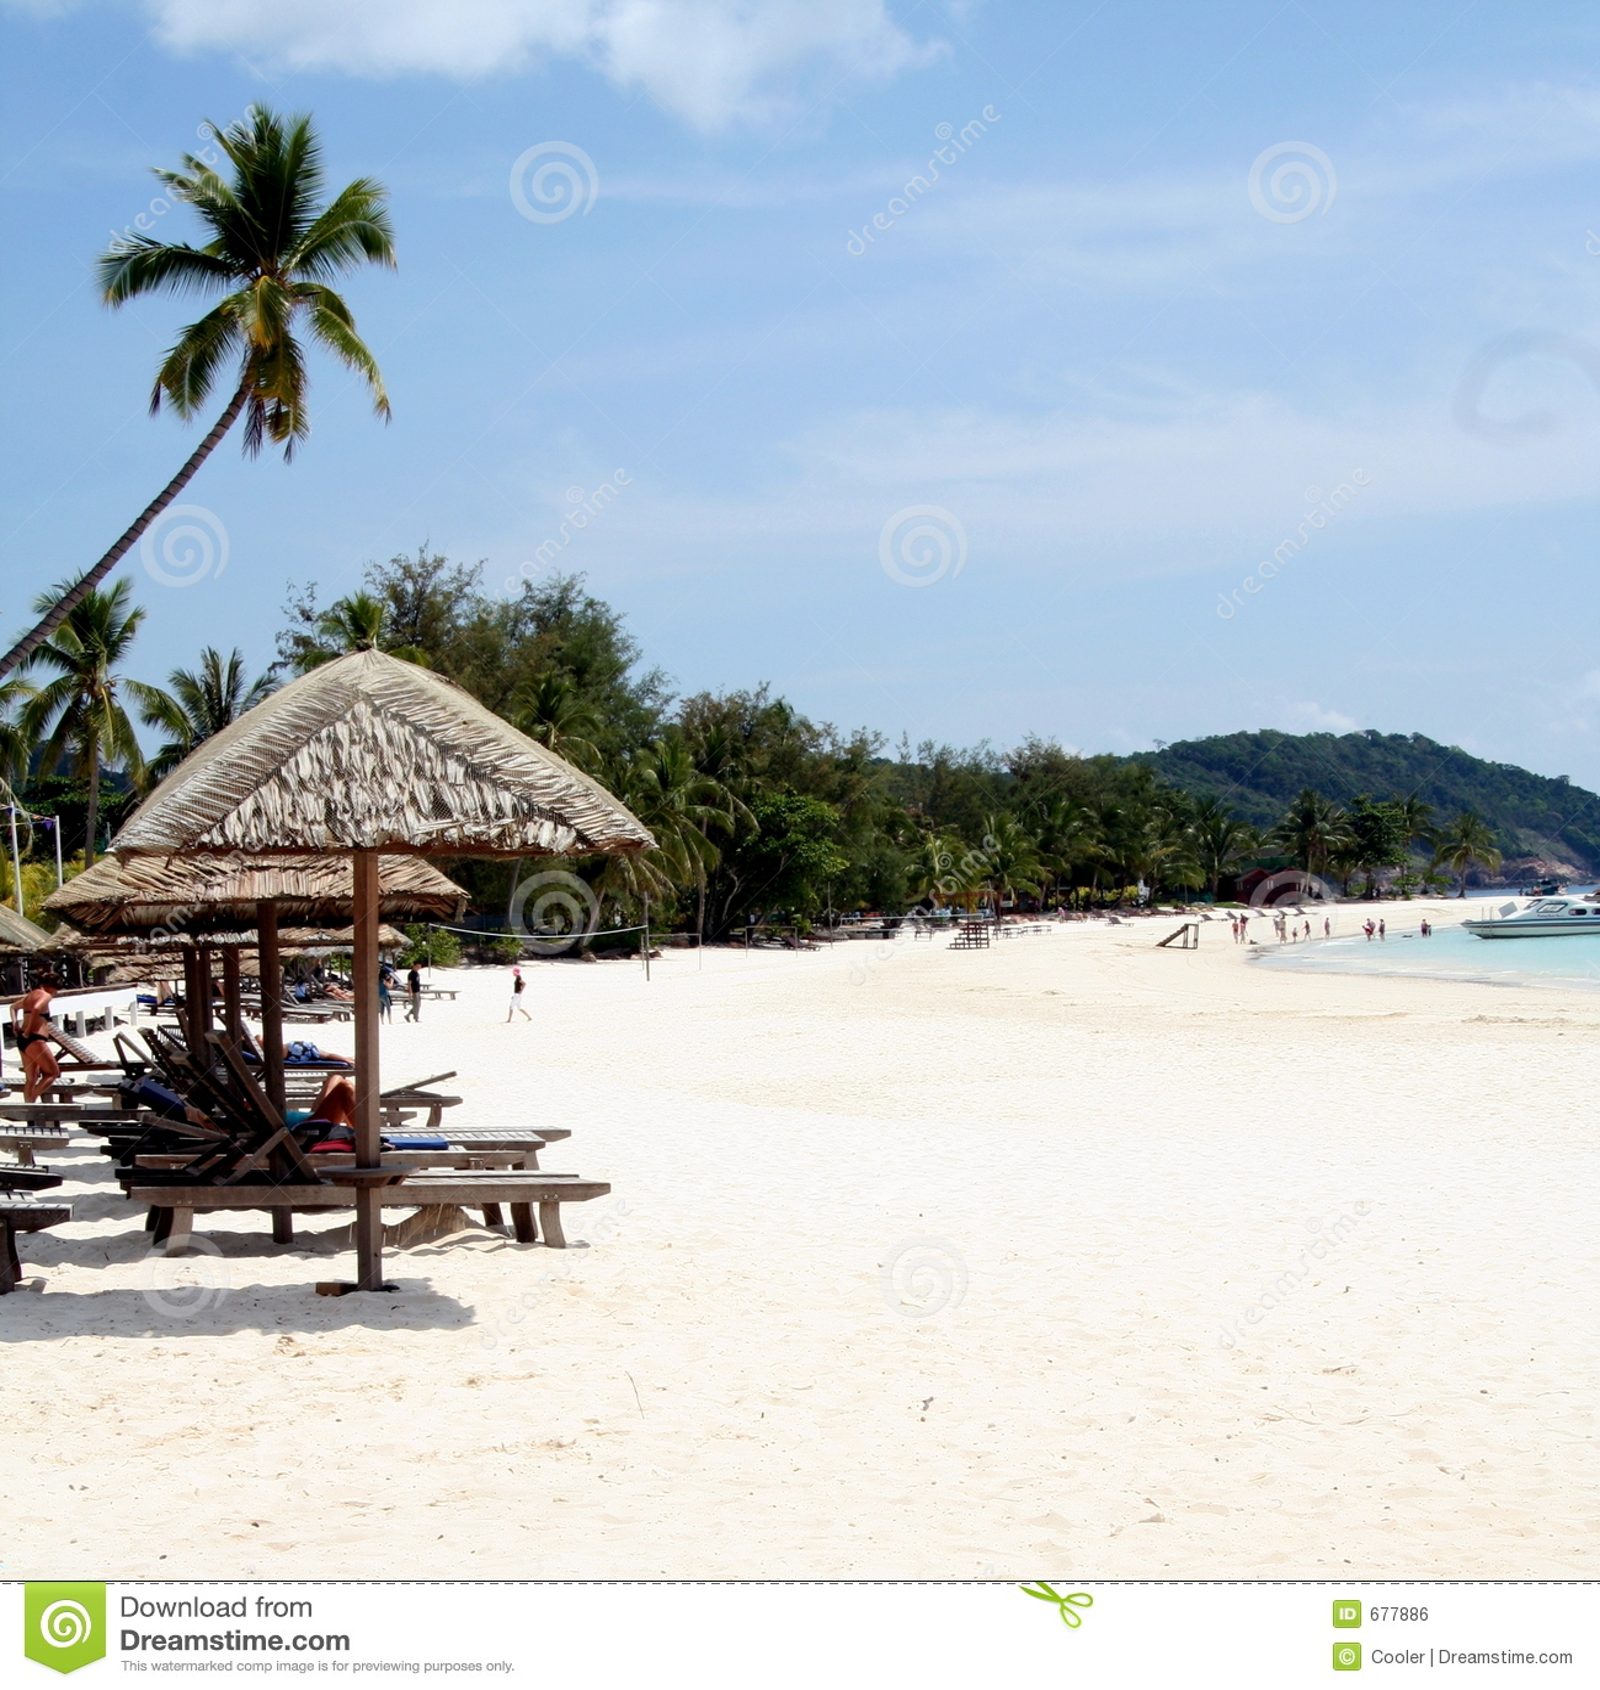 Malaysia Beaches: Malaysian Beach Royalty Free Stock Image